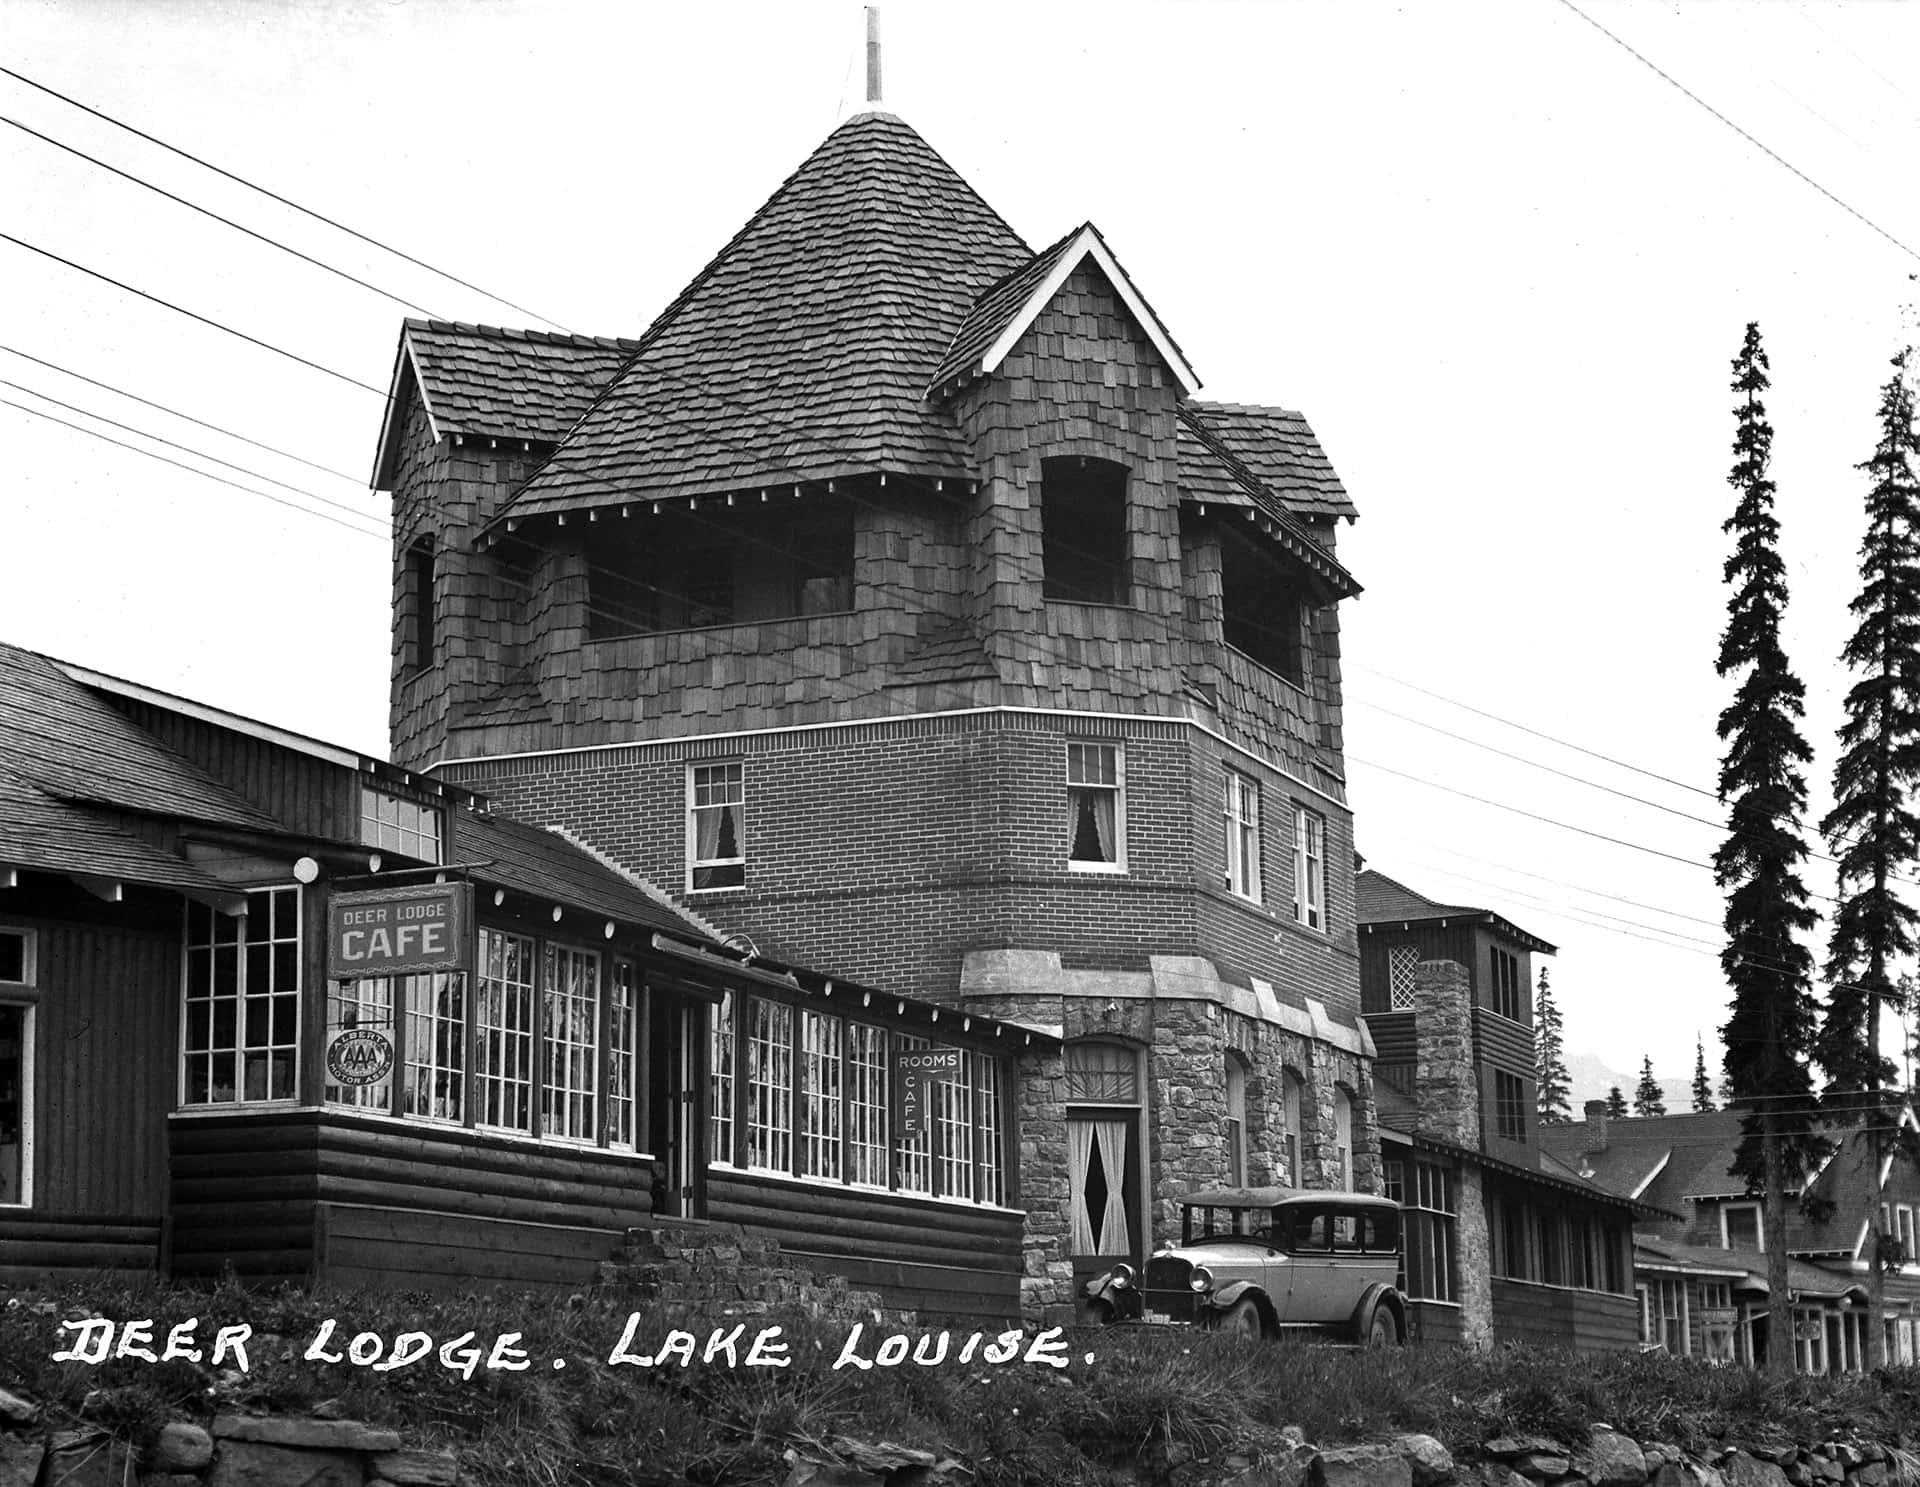 History at Deer Lodge in Lake Louise